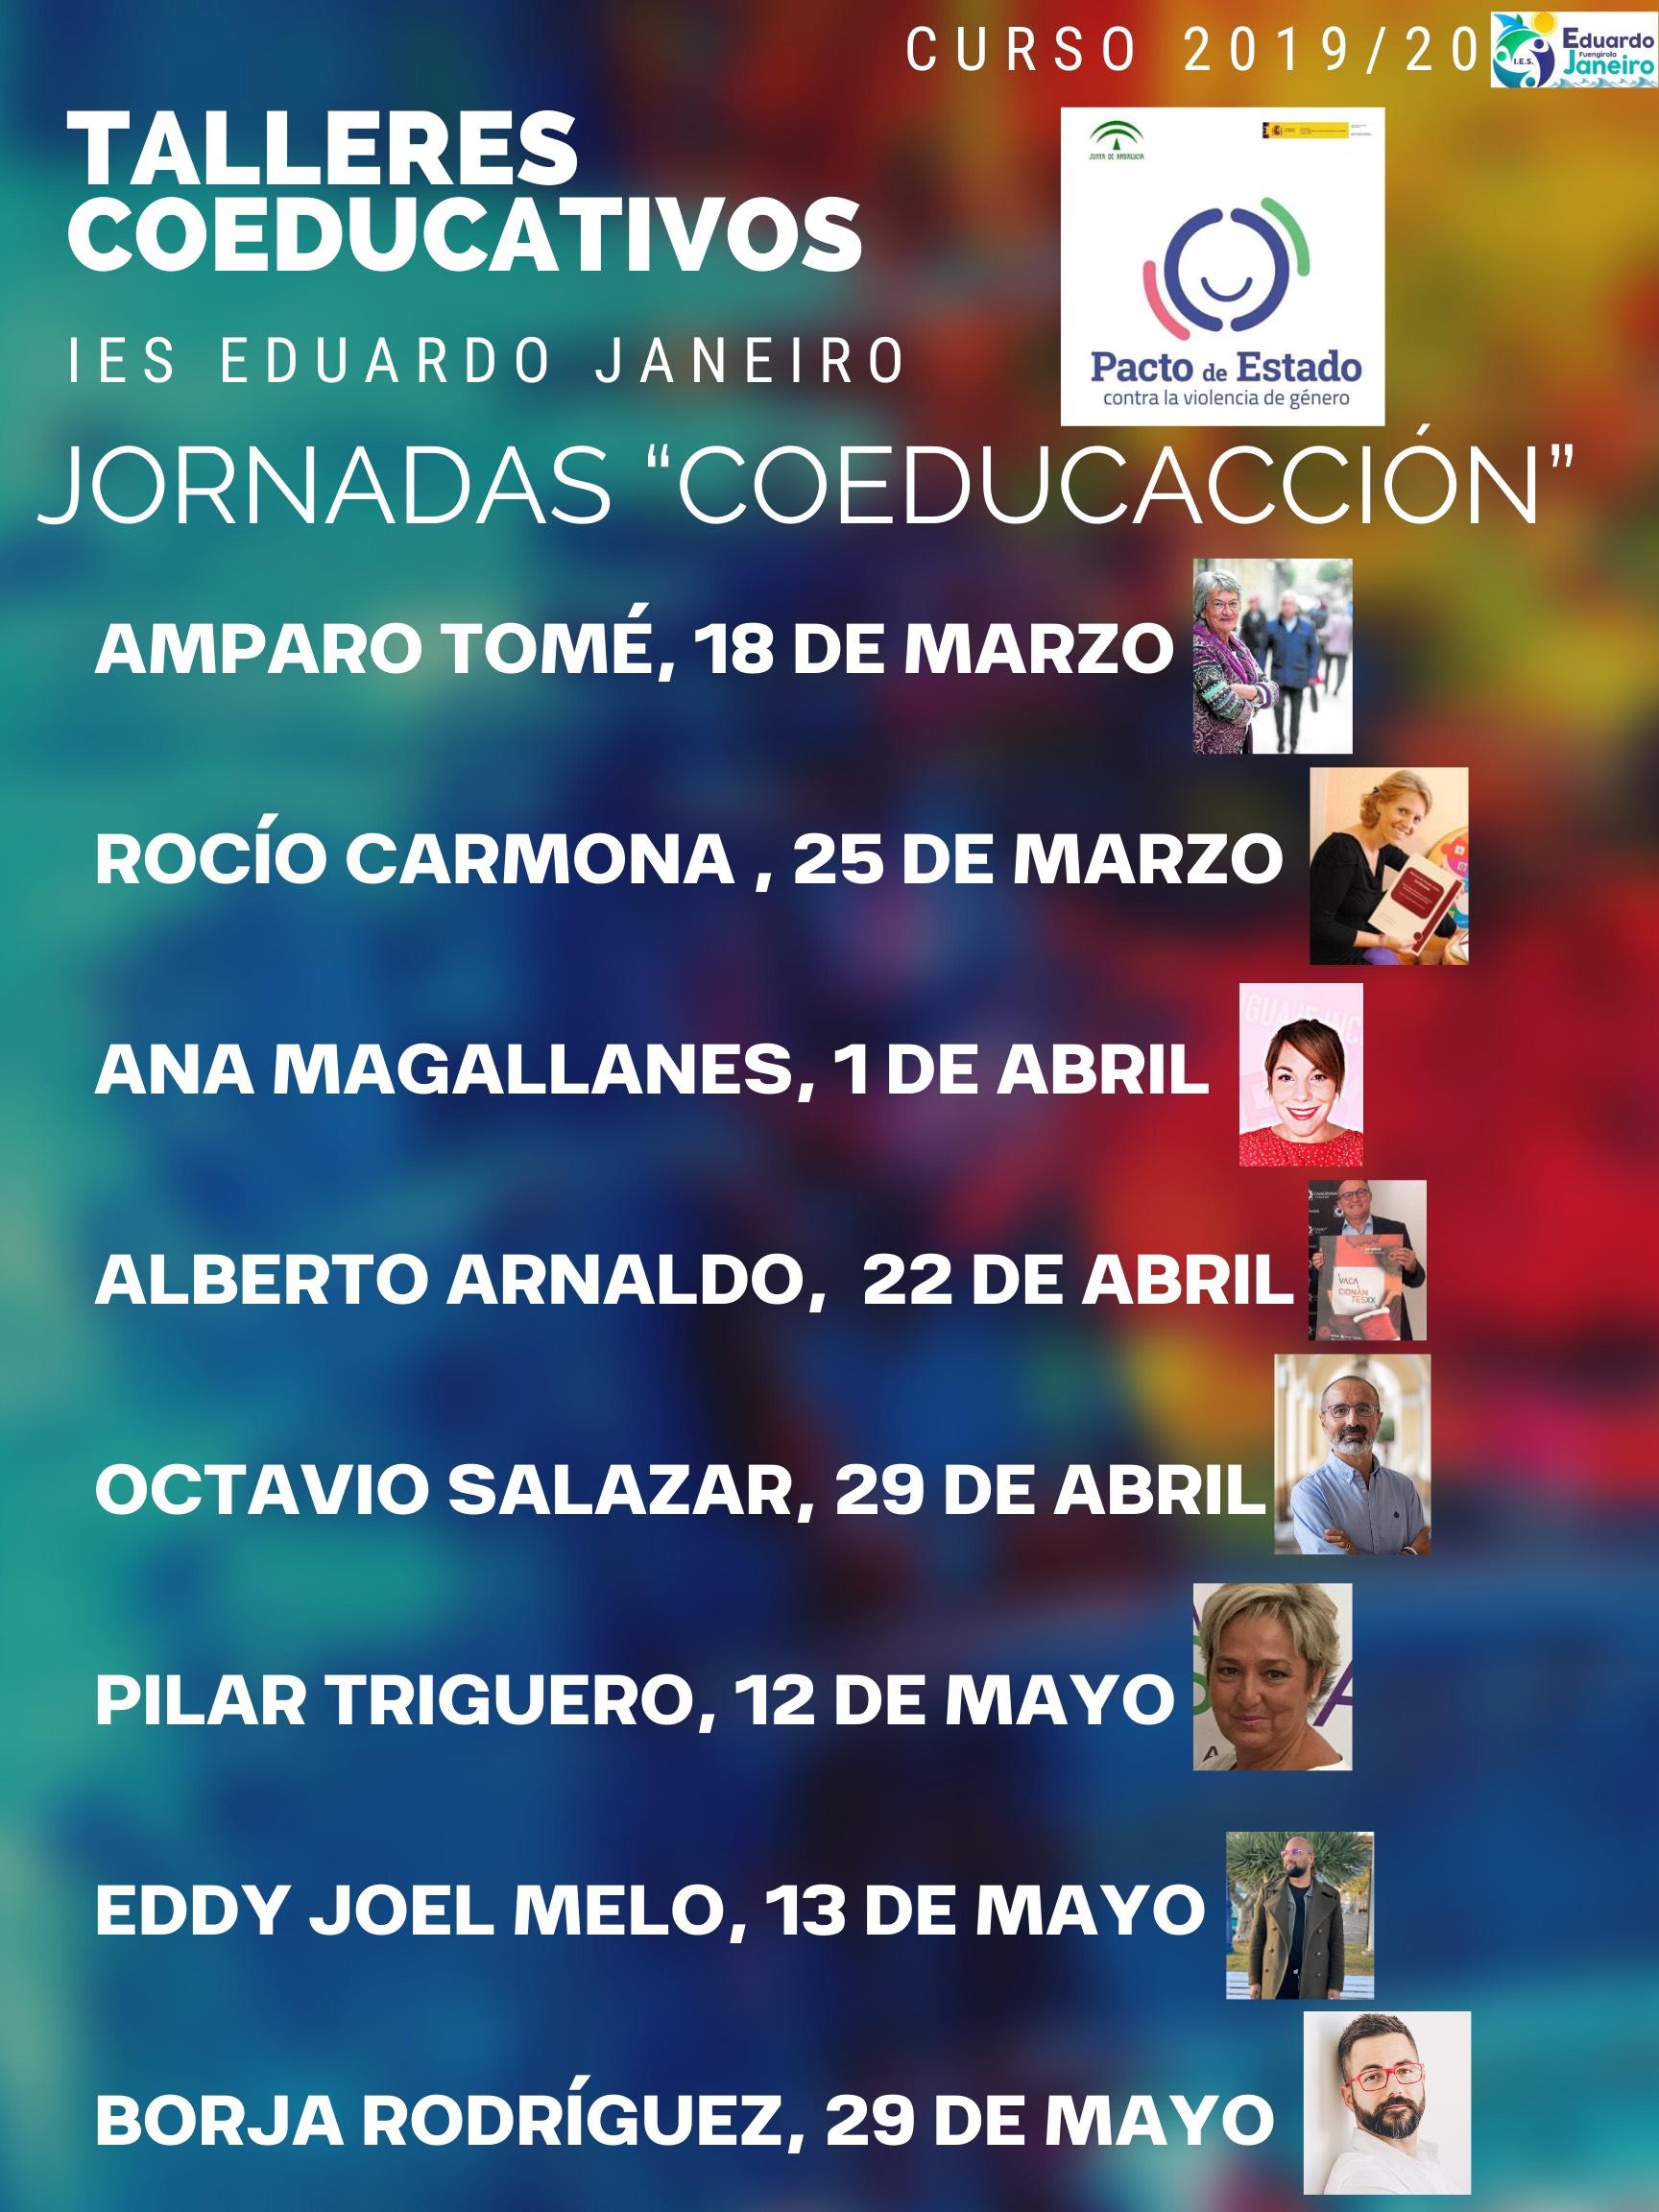 jornadas-coeducacciocc81n